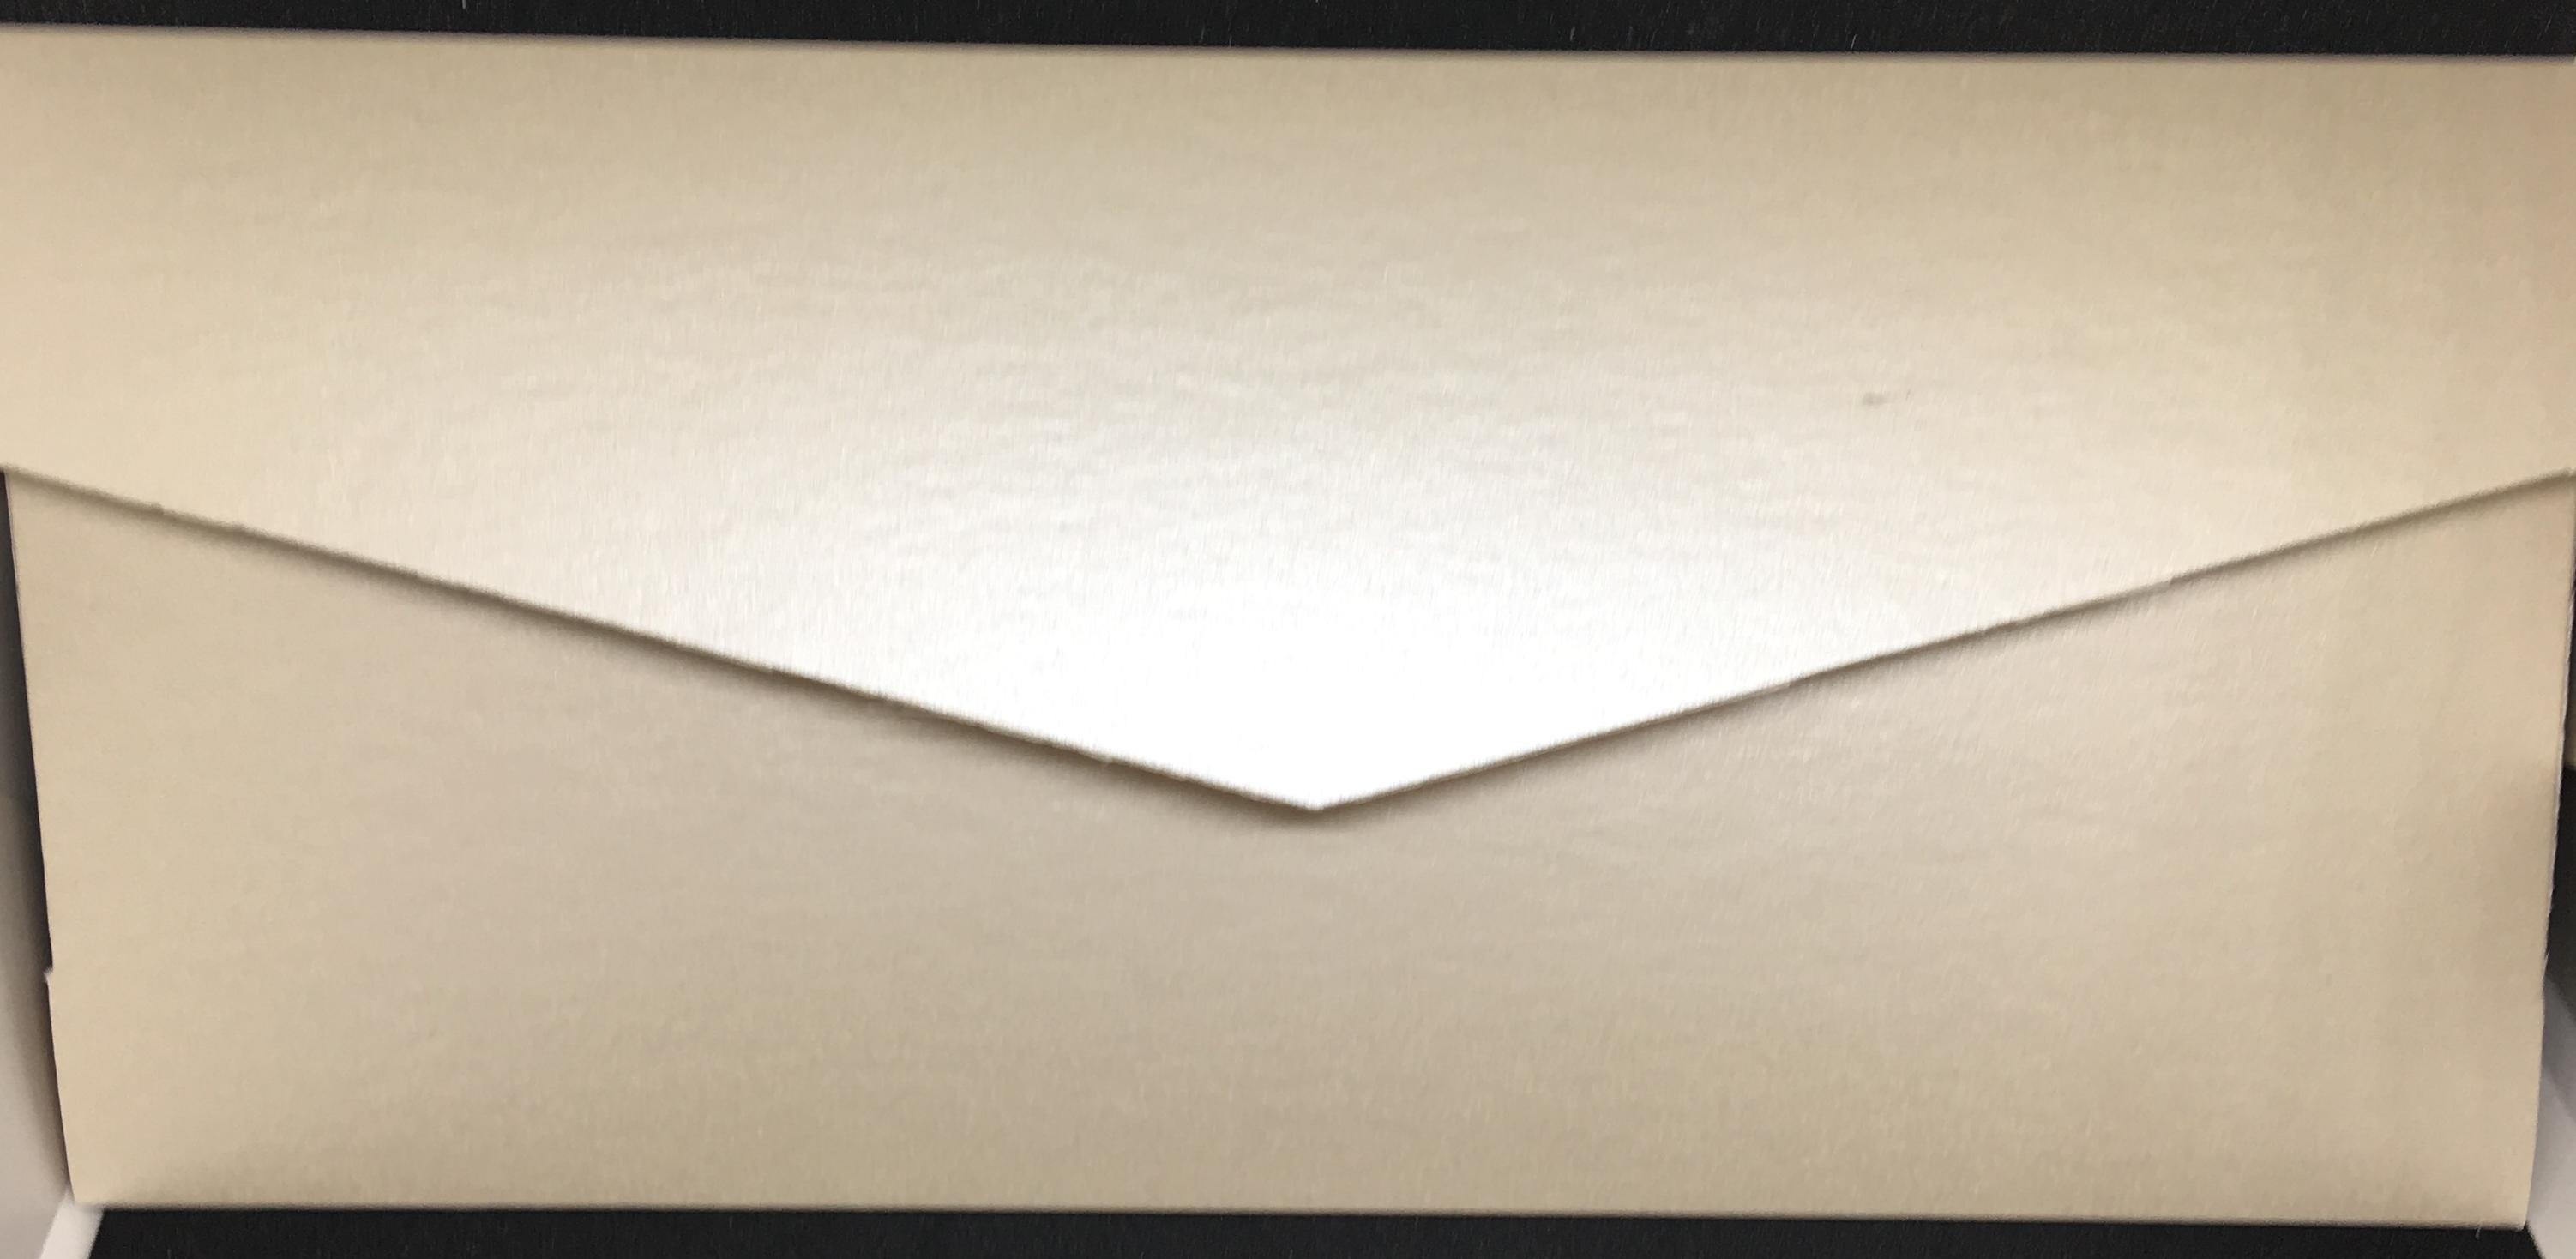 Autograph pocketfold - £2.50